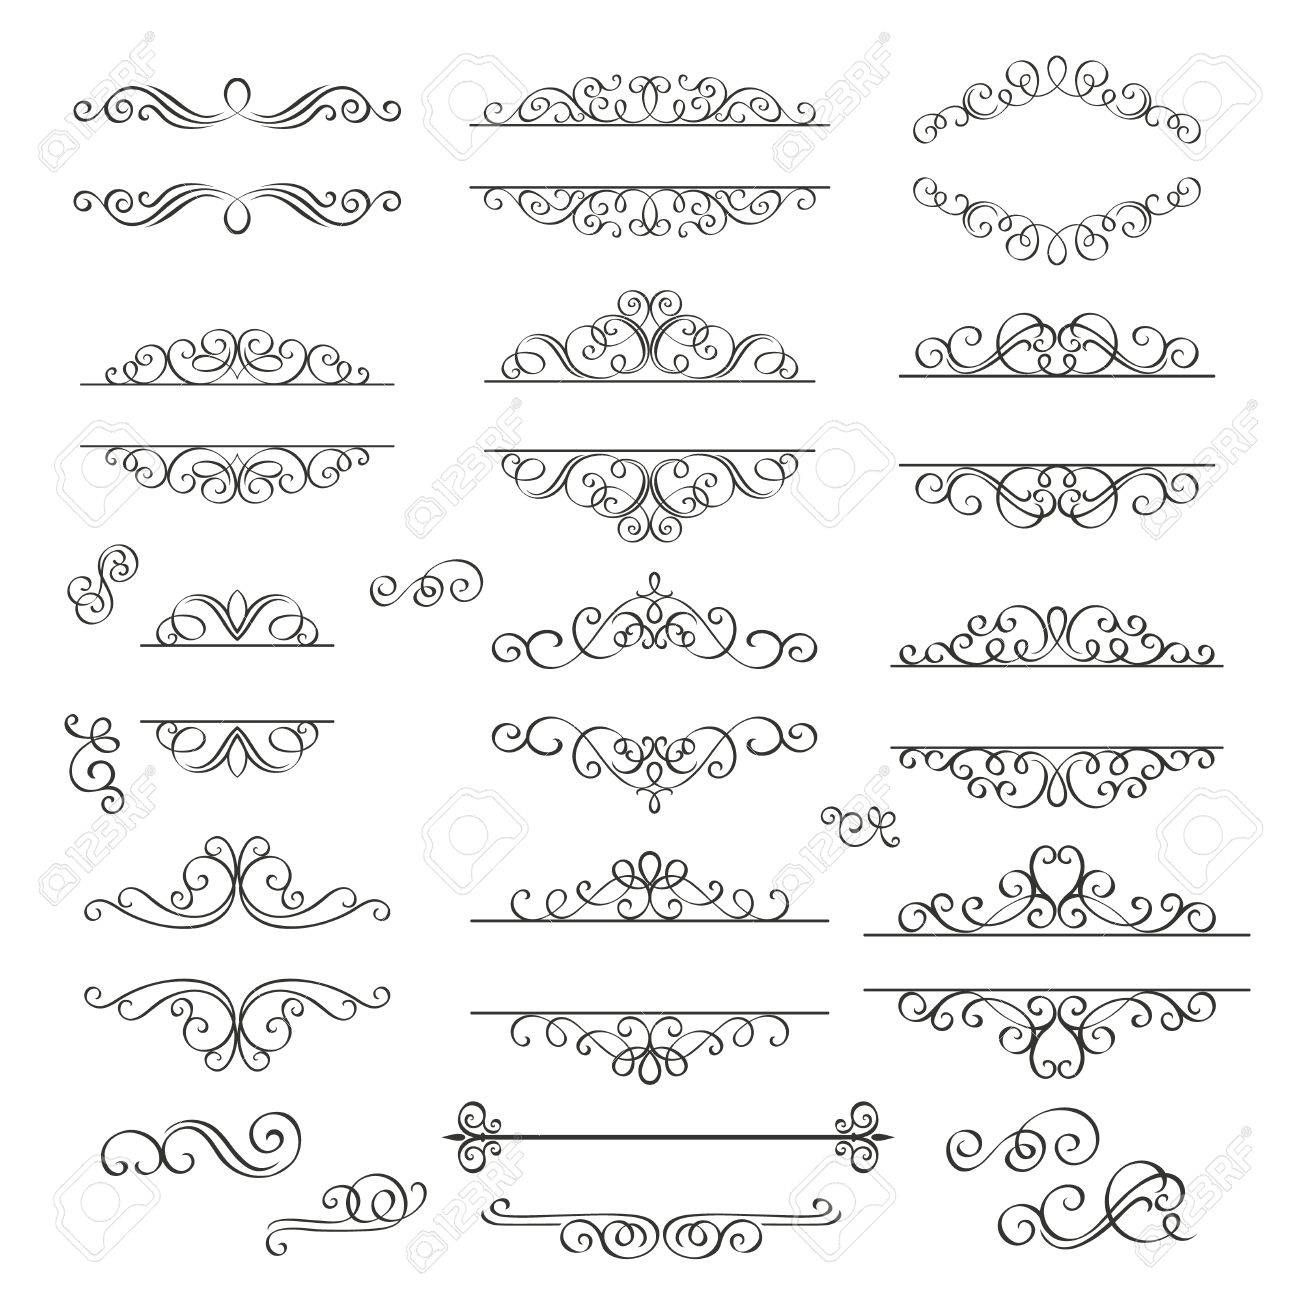 Set Swirls Decorative Design Elements Decorative Victorian Style